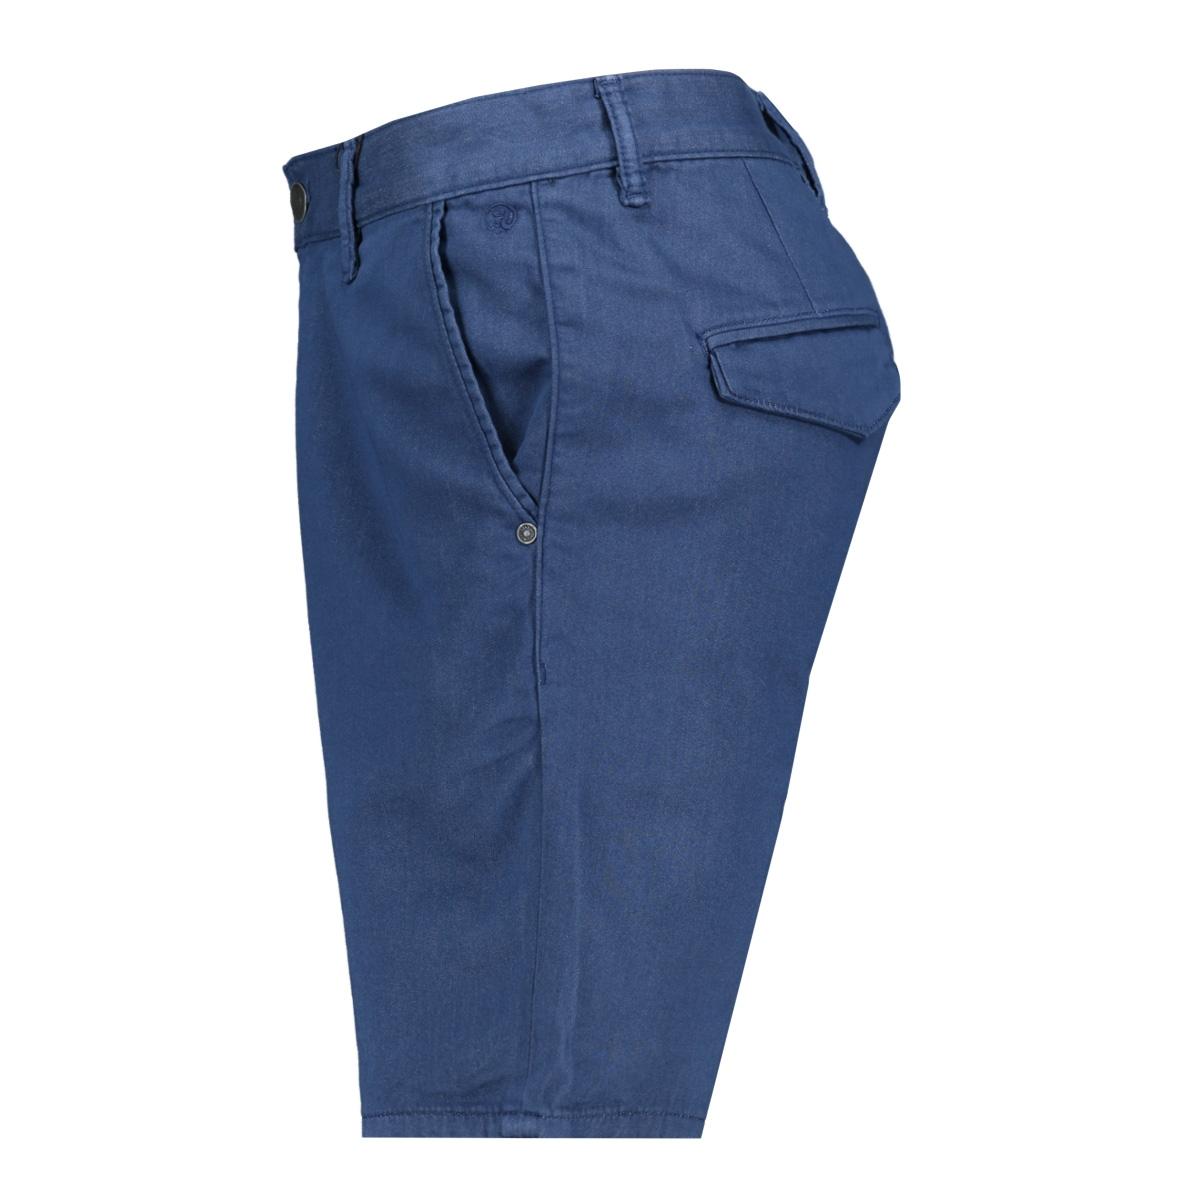 chino shorts stretch sweat csh203112 cast iron korte broek 5117